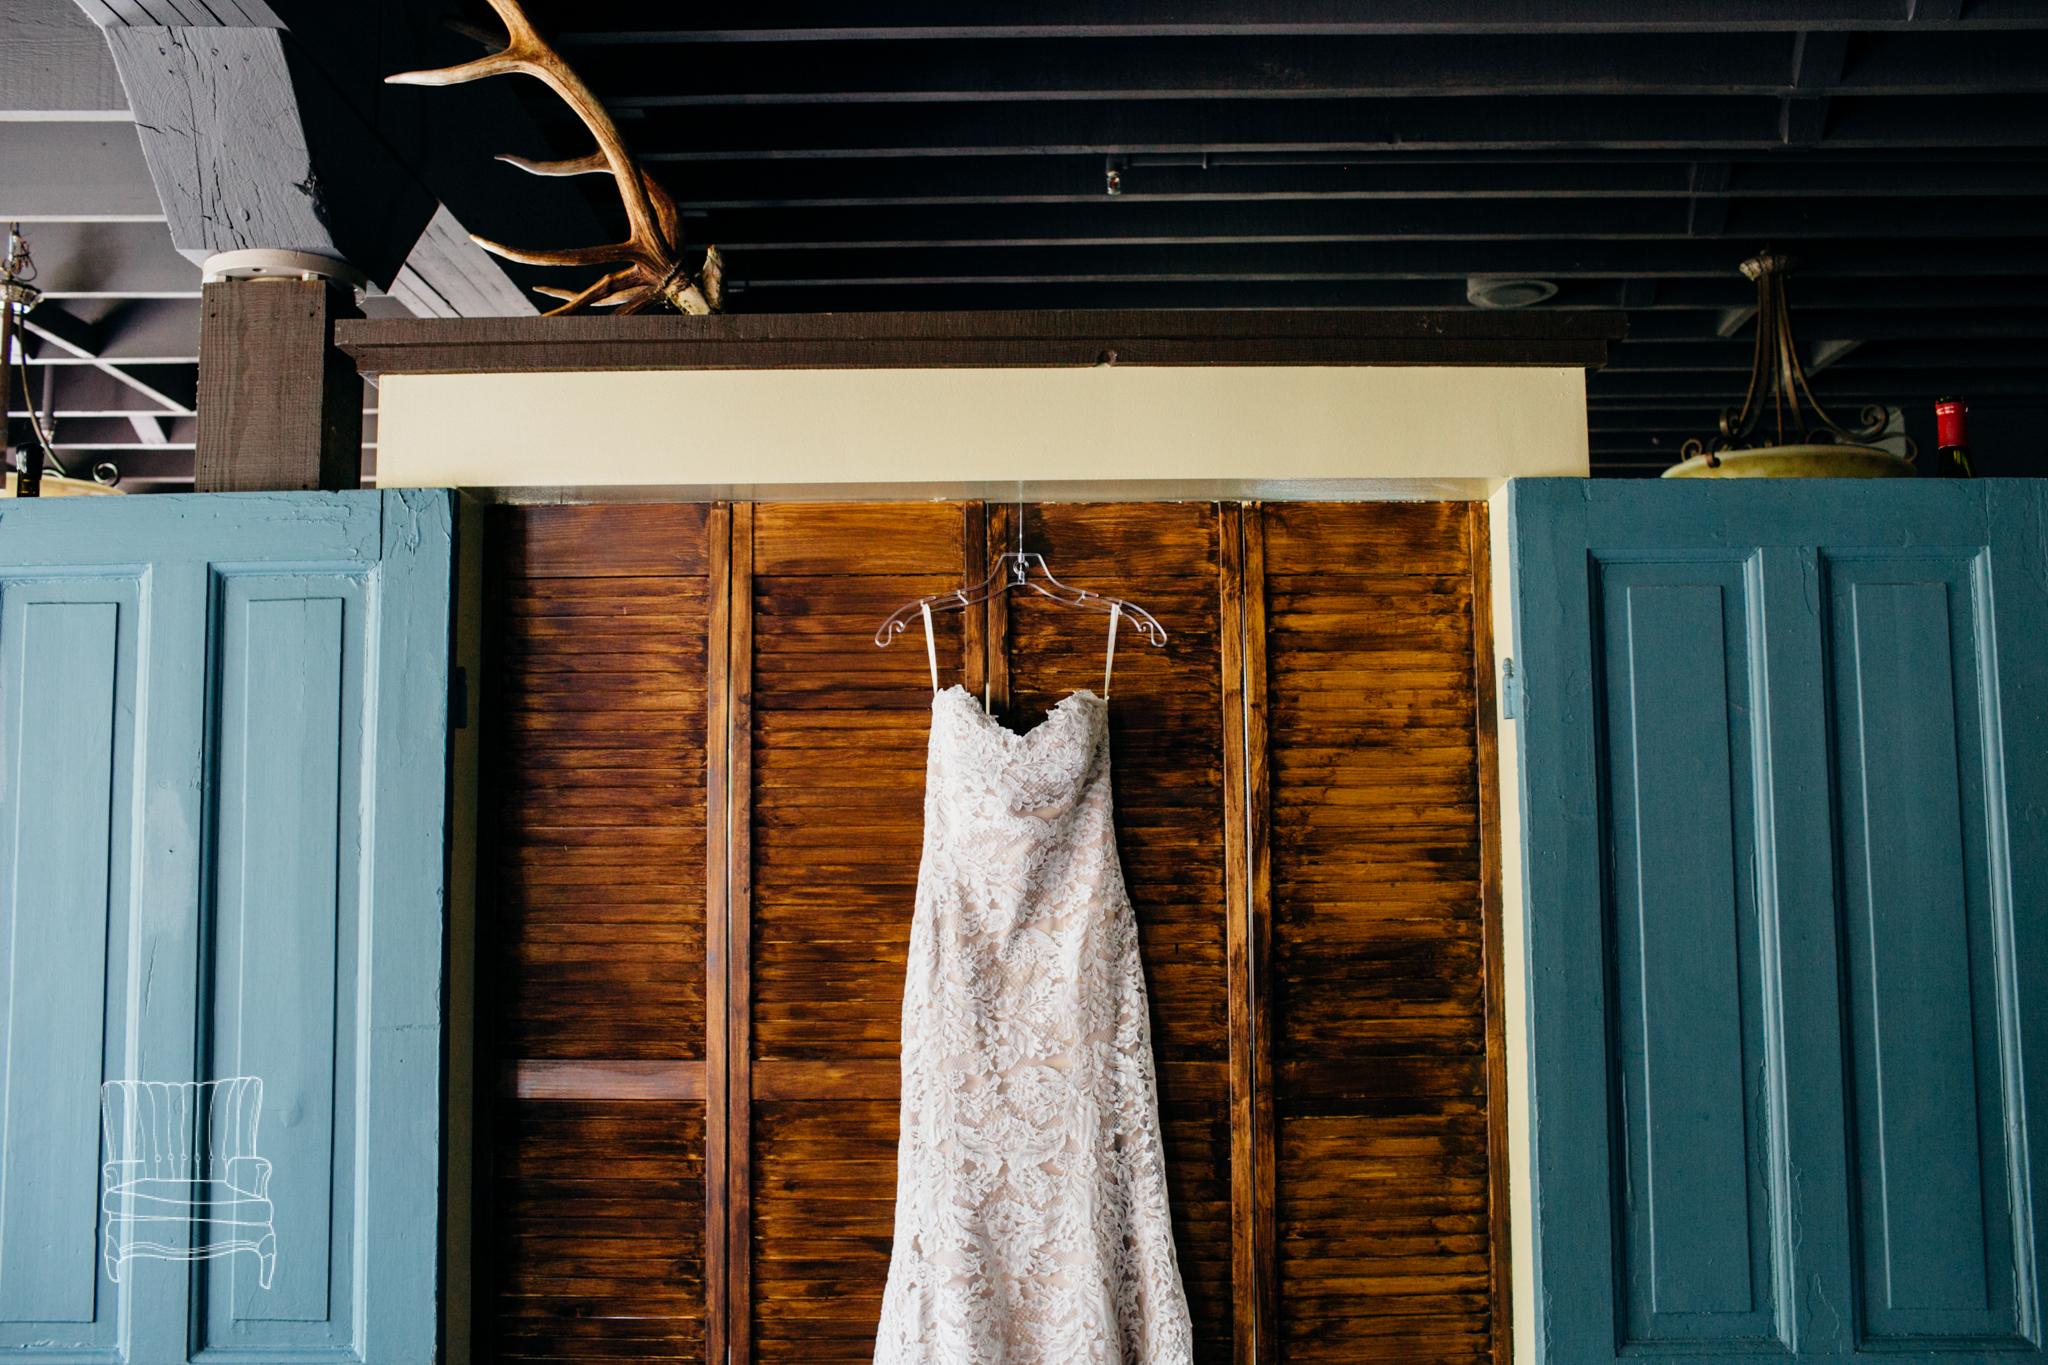 seattle-wedding-photographer-katheryn-moran-russells-bothell-wilkins-wedding-photo-1.jpg